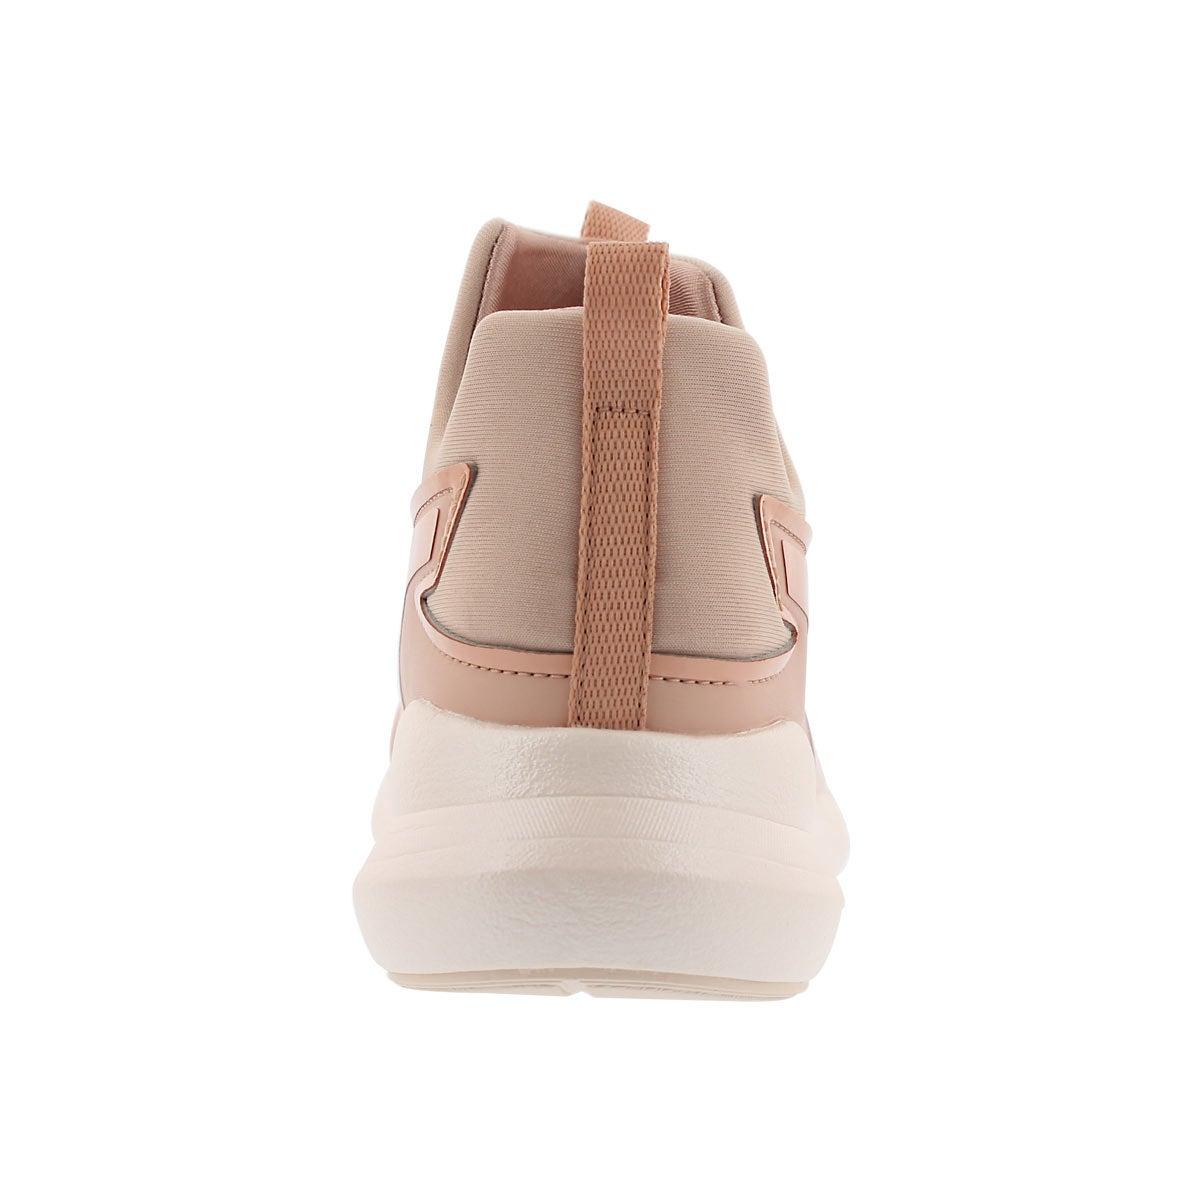 Lds Puma Rebel Mid peach sneaker